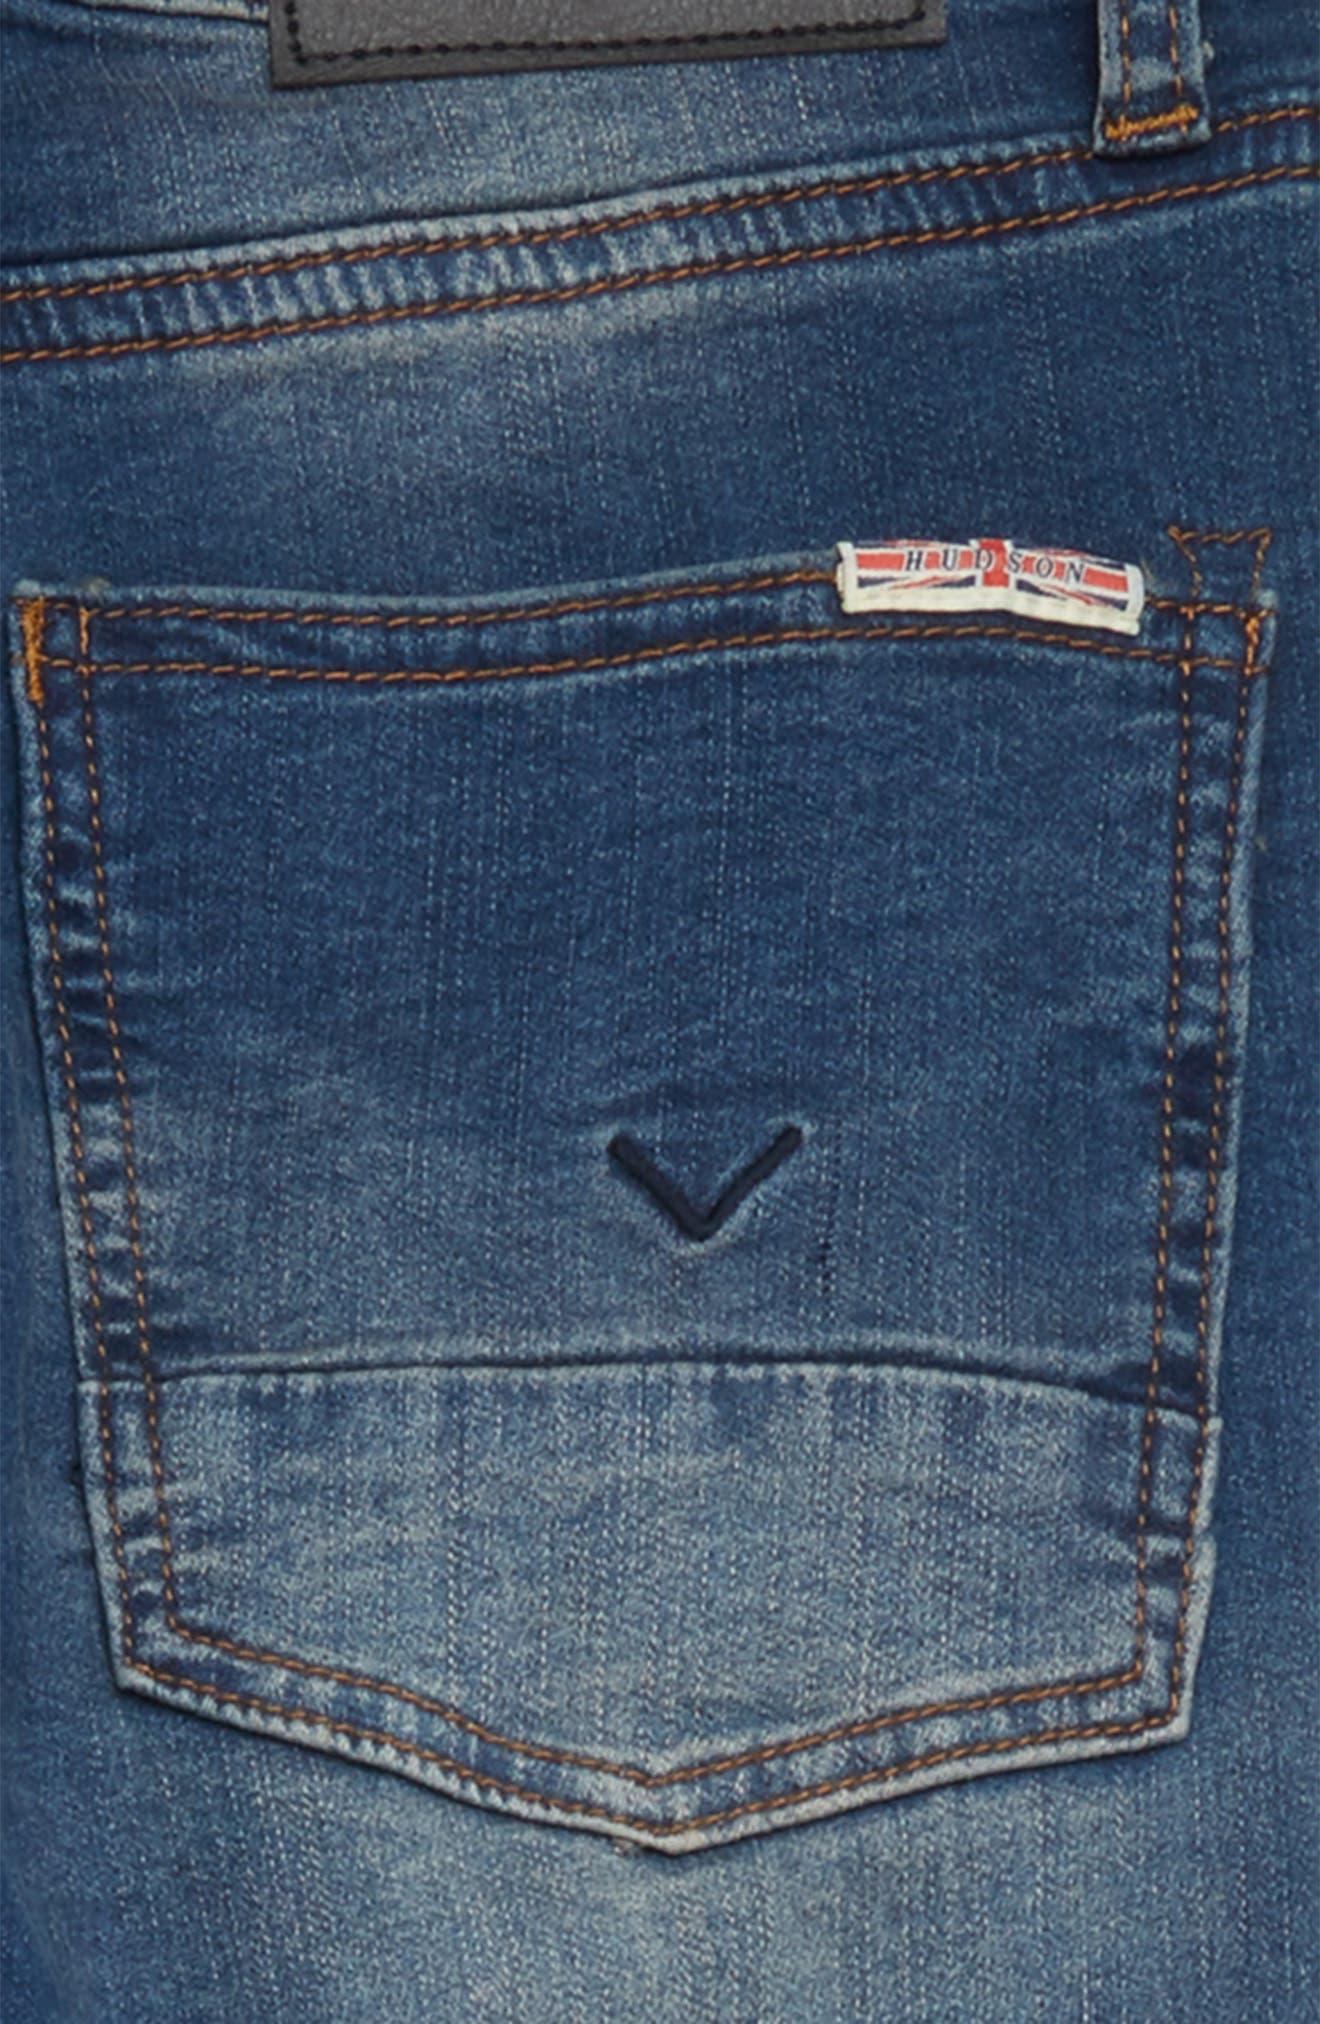 Jagger Slim Fit Straight Leg Jeans,                             Alternate thumbnail 3, color,                             Beaten Blue